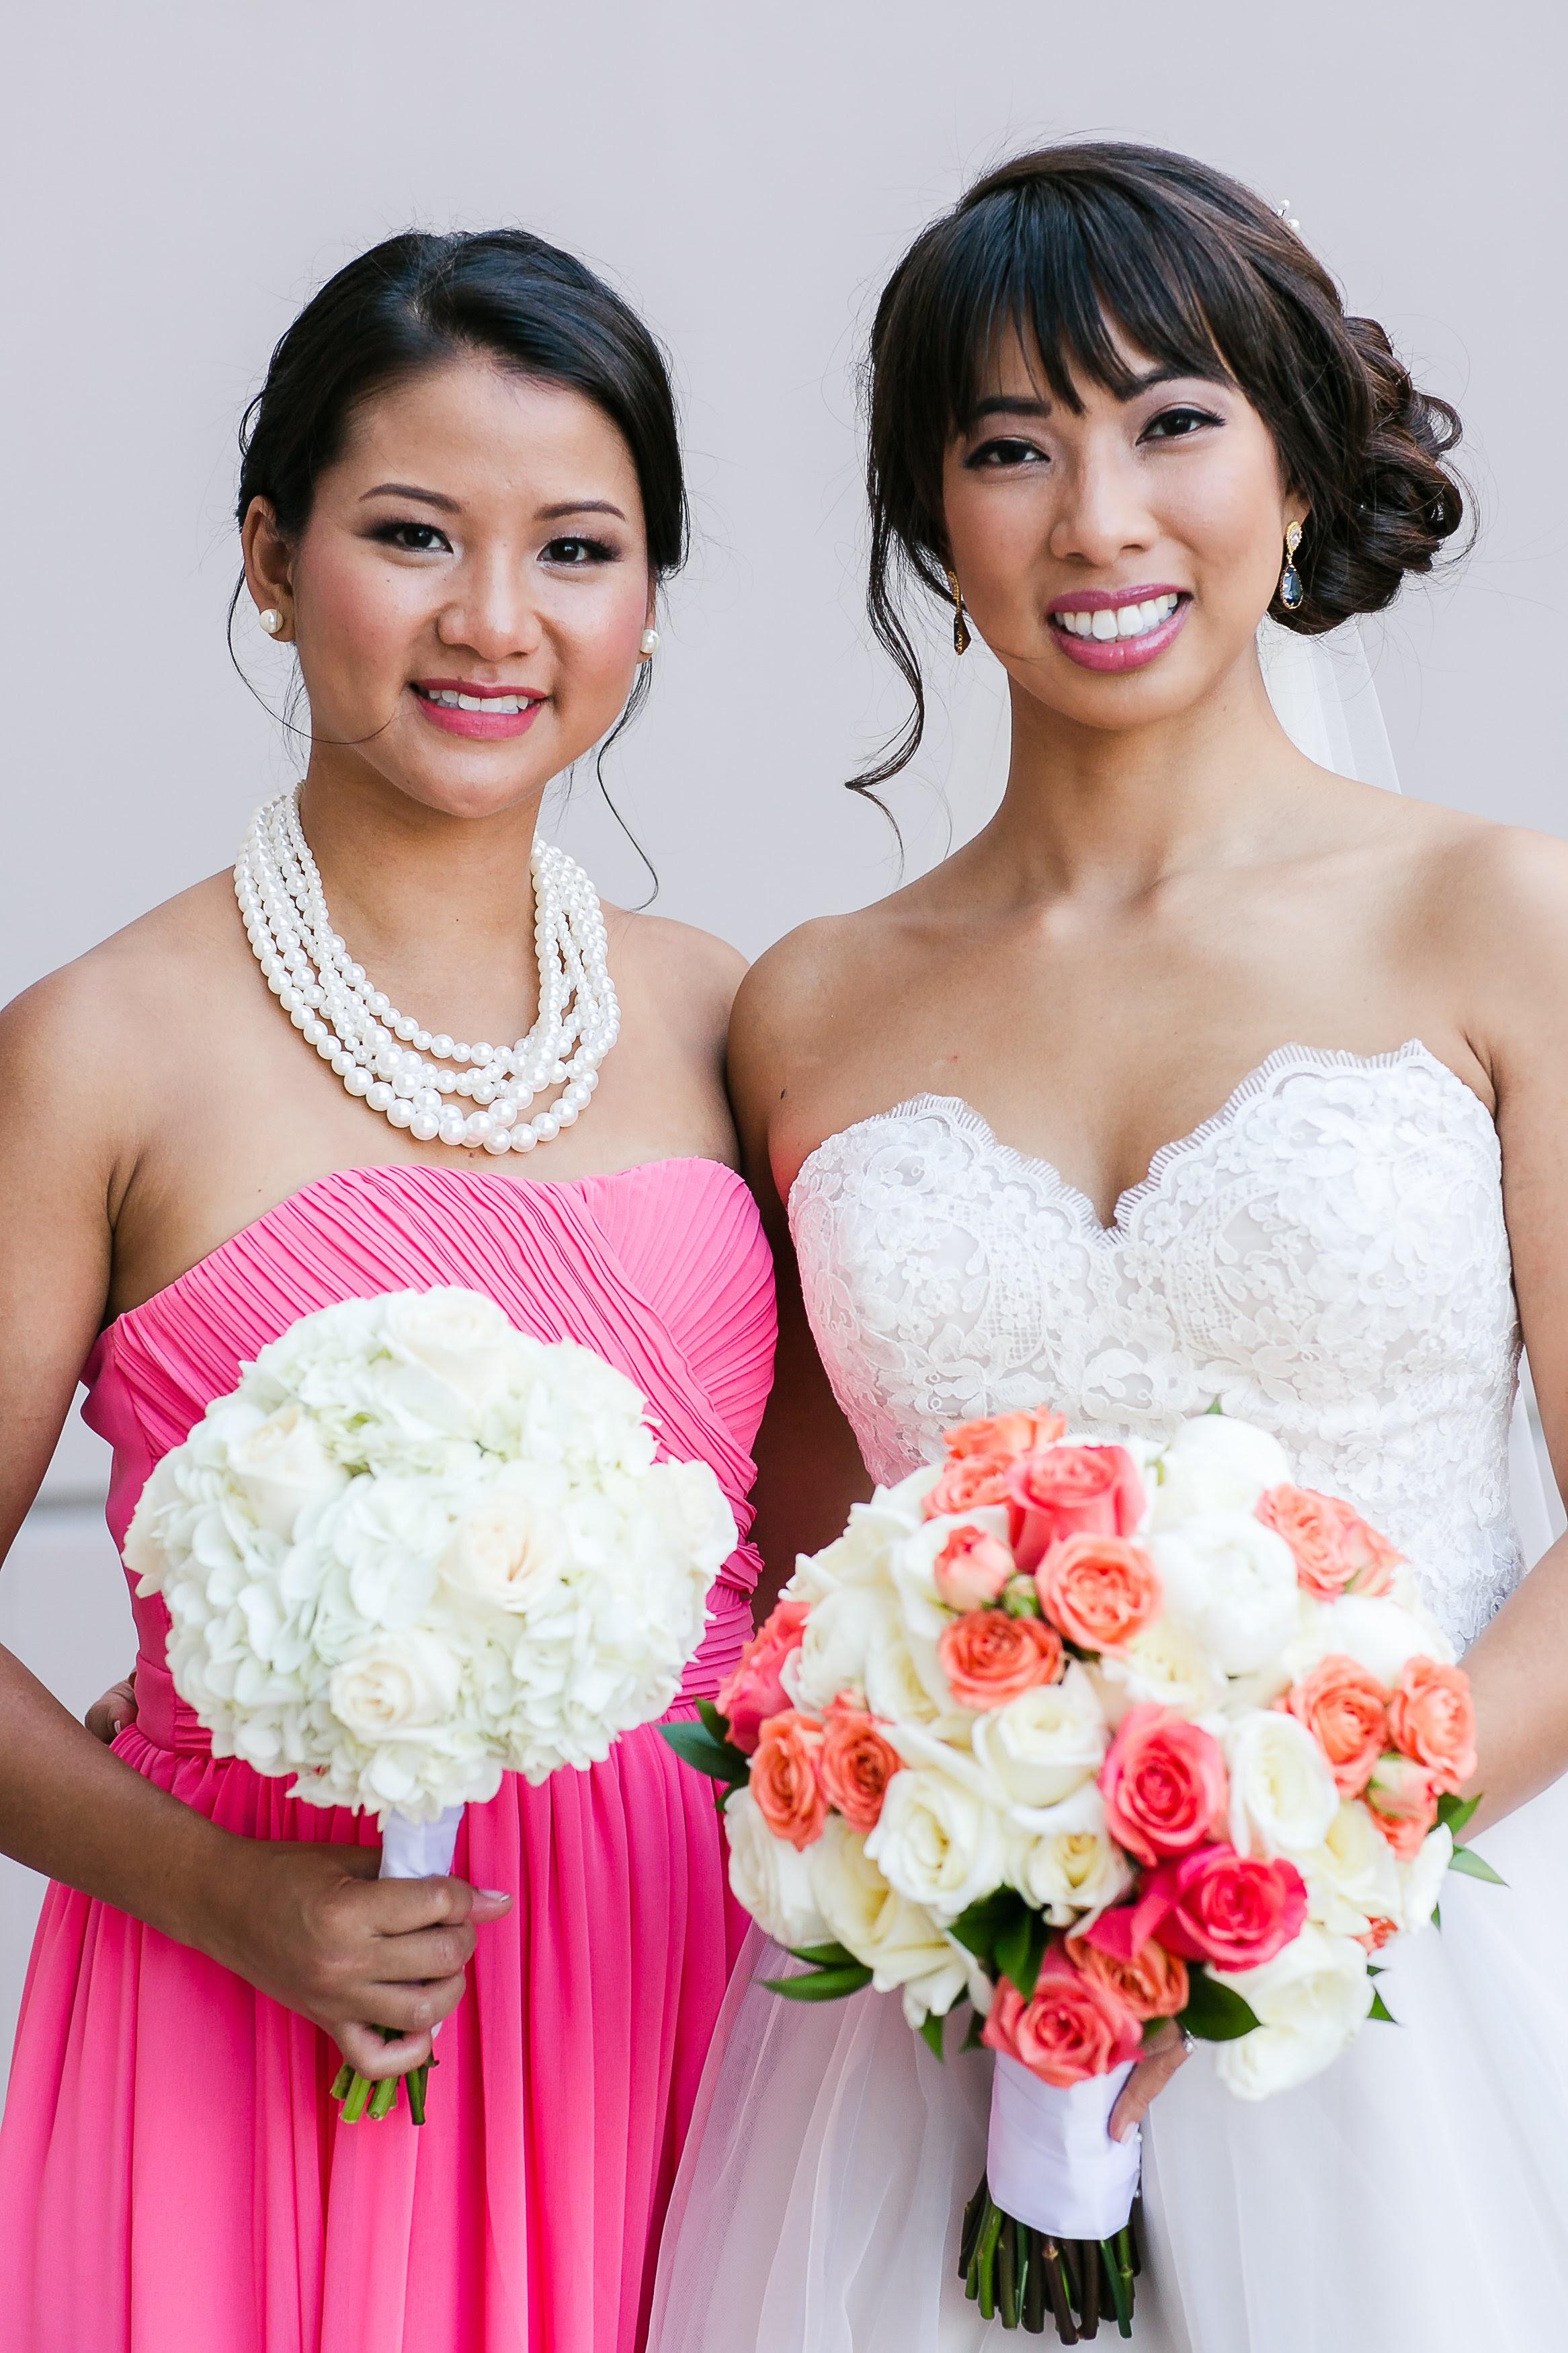 Blue Jewelry - Swarovski Earrings - Blue and Coral Wedding